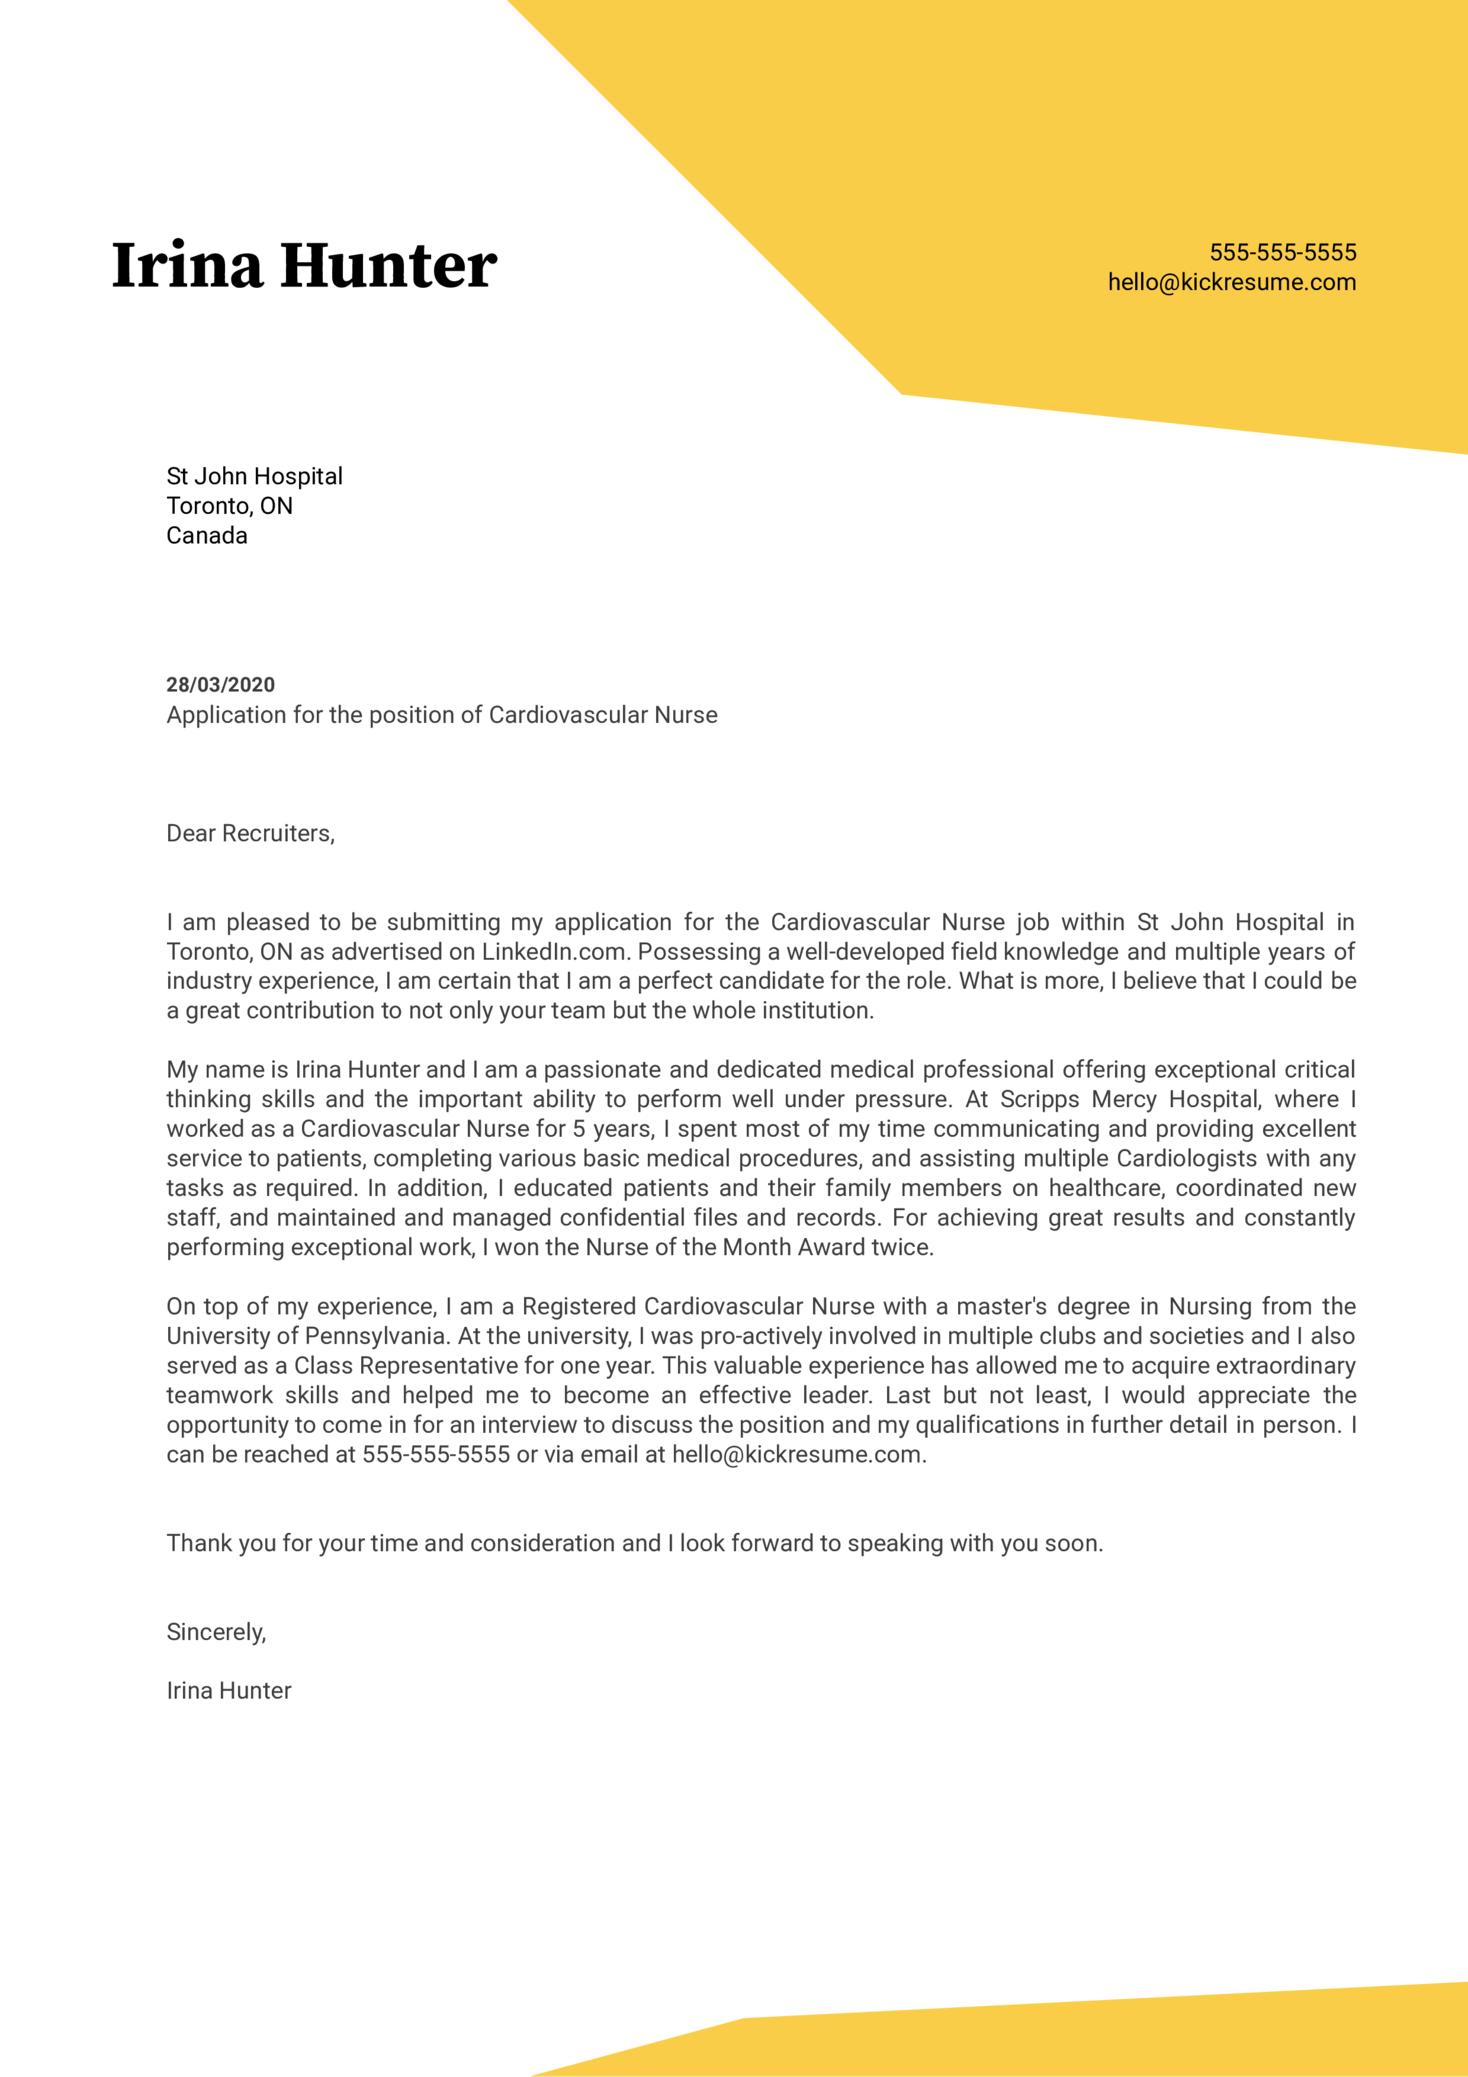 Cardiovascular Nurse Cover Letter Example Kickresume